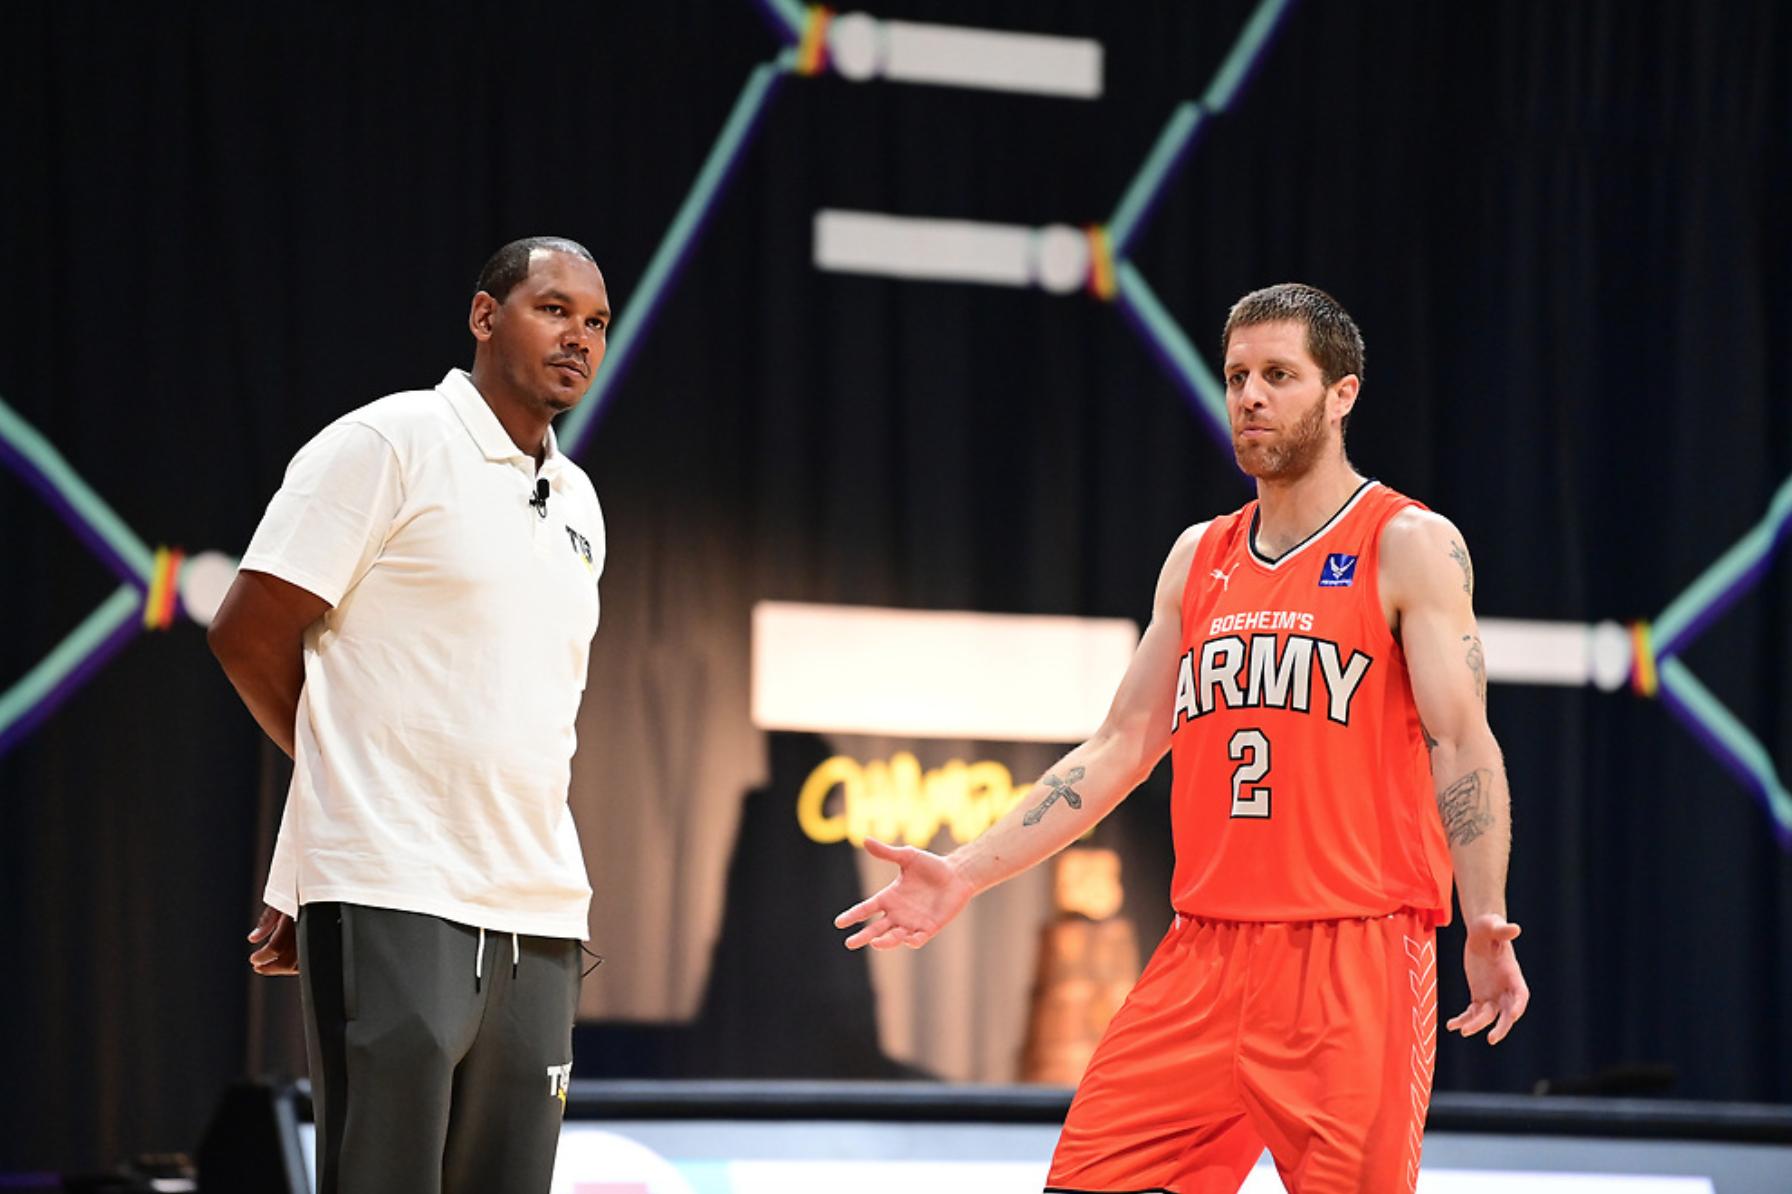 Boeheim's Army head coach Ryan Blackwell with Eric Devendorf